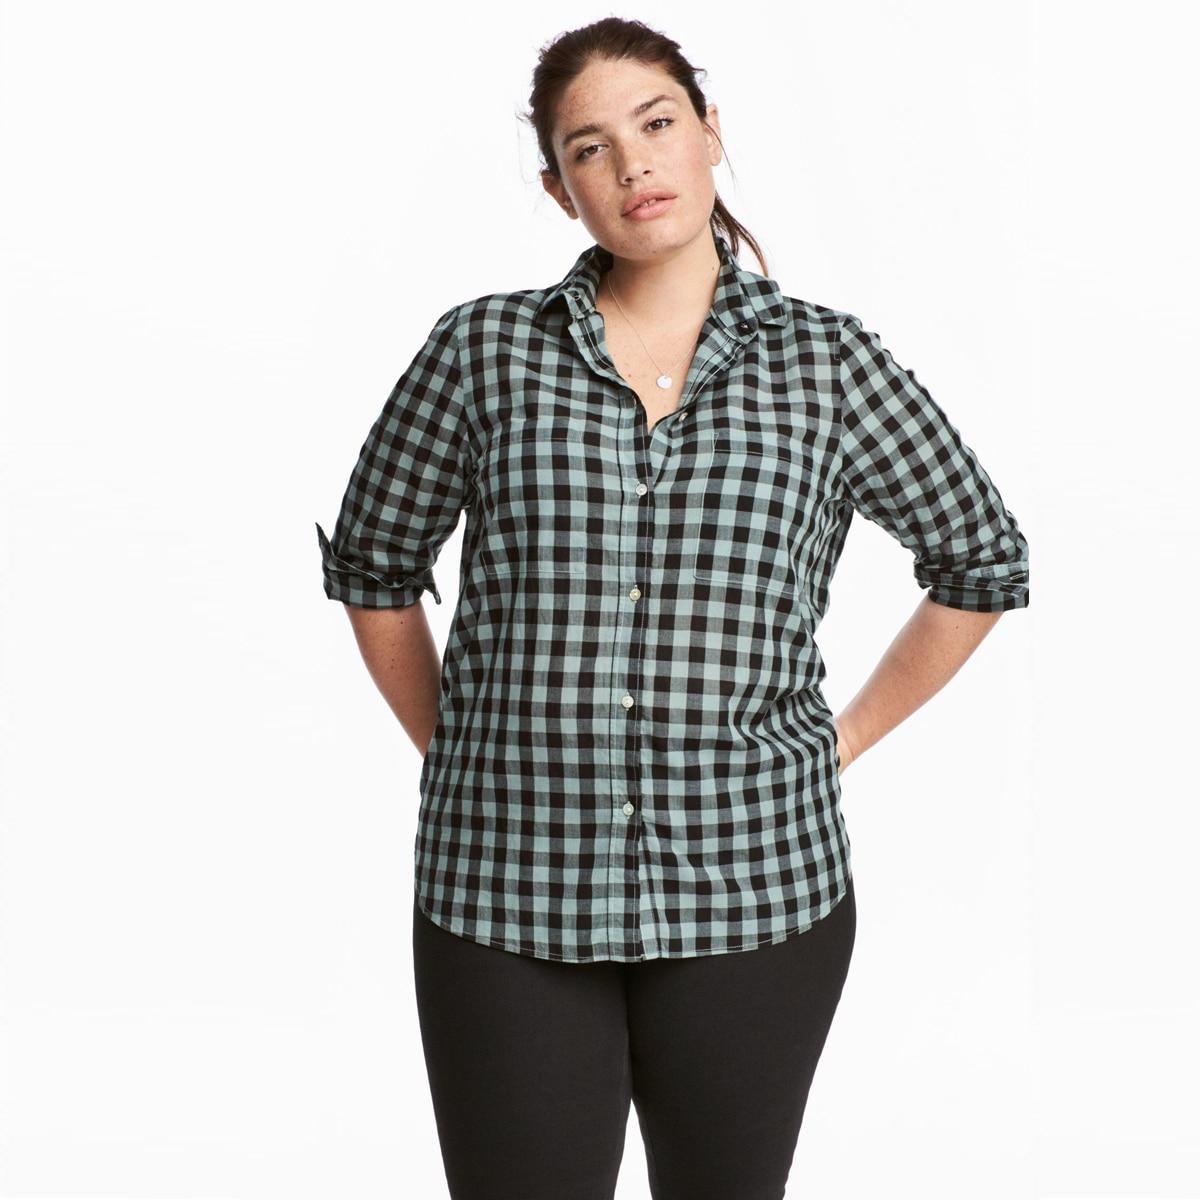 MCO Autumn Basic Plus Size Check Top For Office Ladies Simple Oversized Women Blouse Classic Plaid Shirt Big Size 5xl 6xl 7xl 2